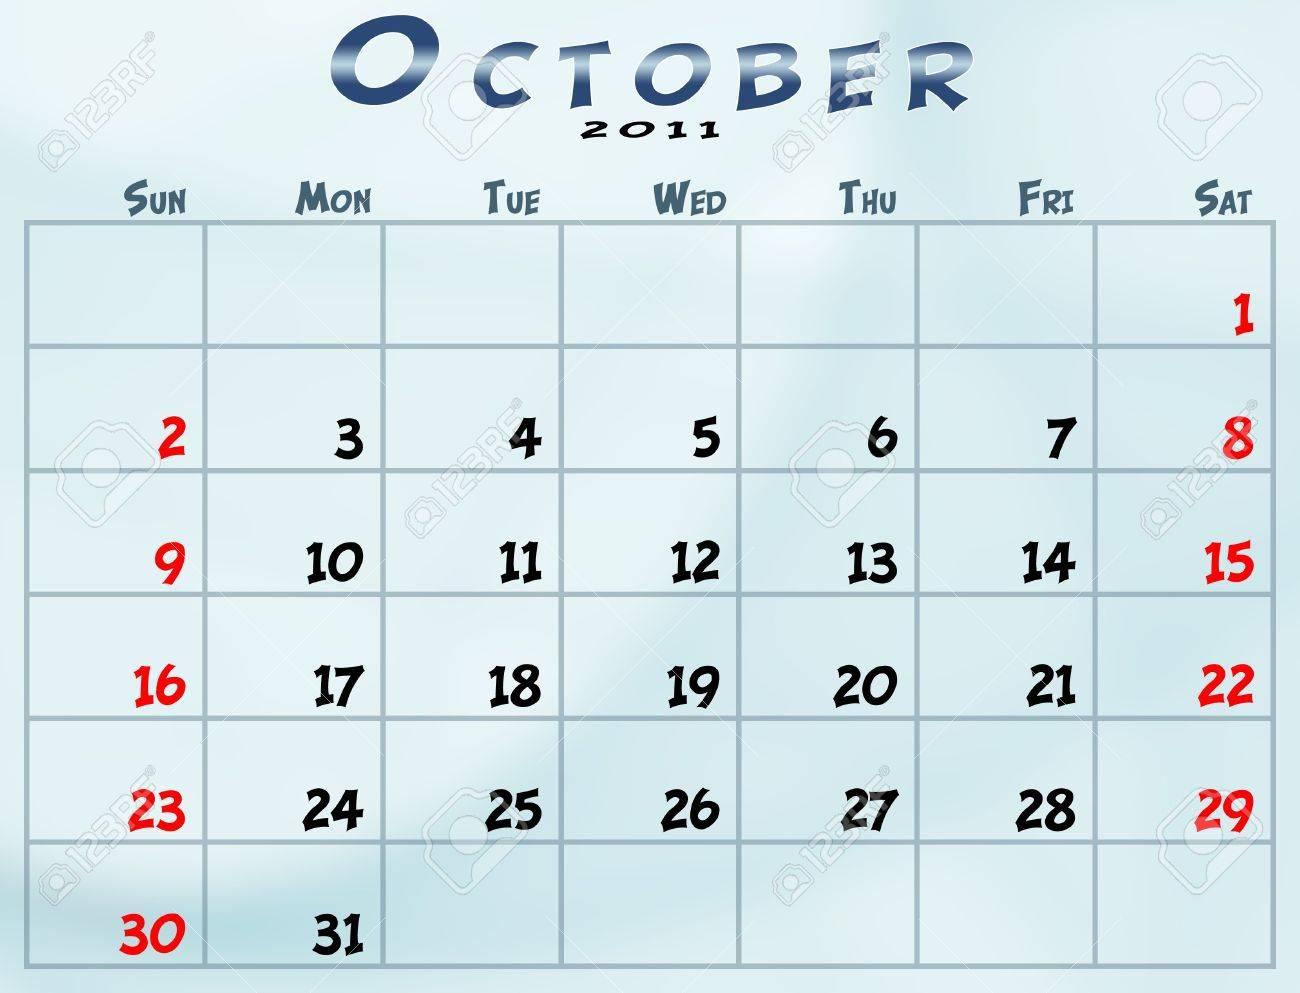 2011 Calendario.October 2011 Calendar From Sunday To Saturday